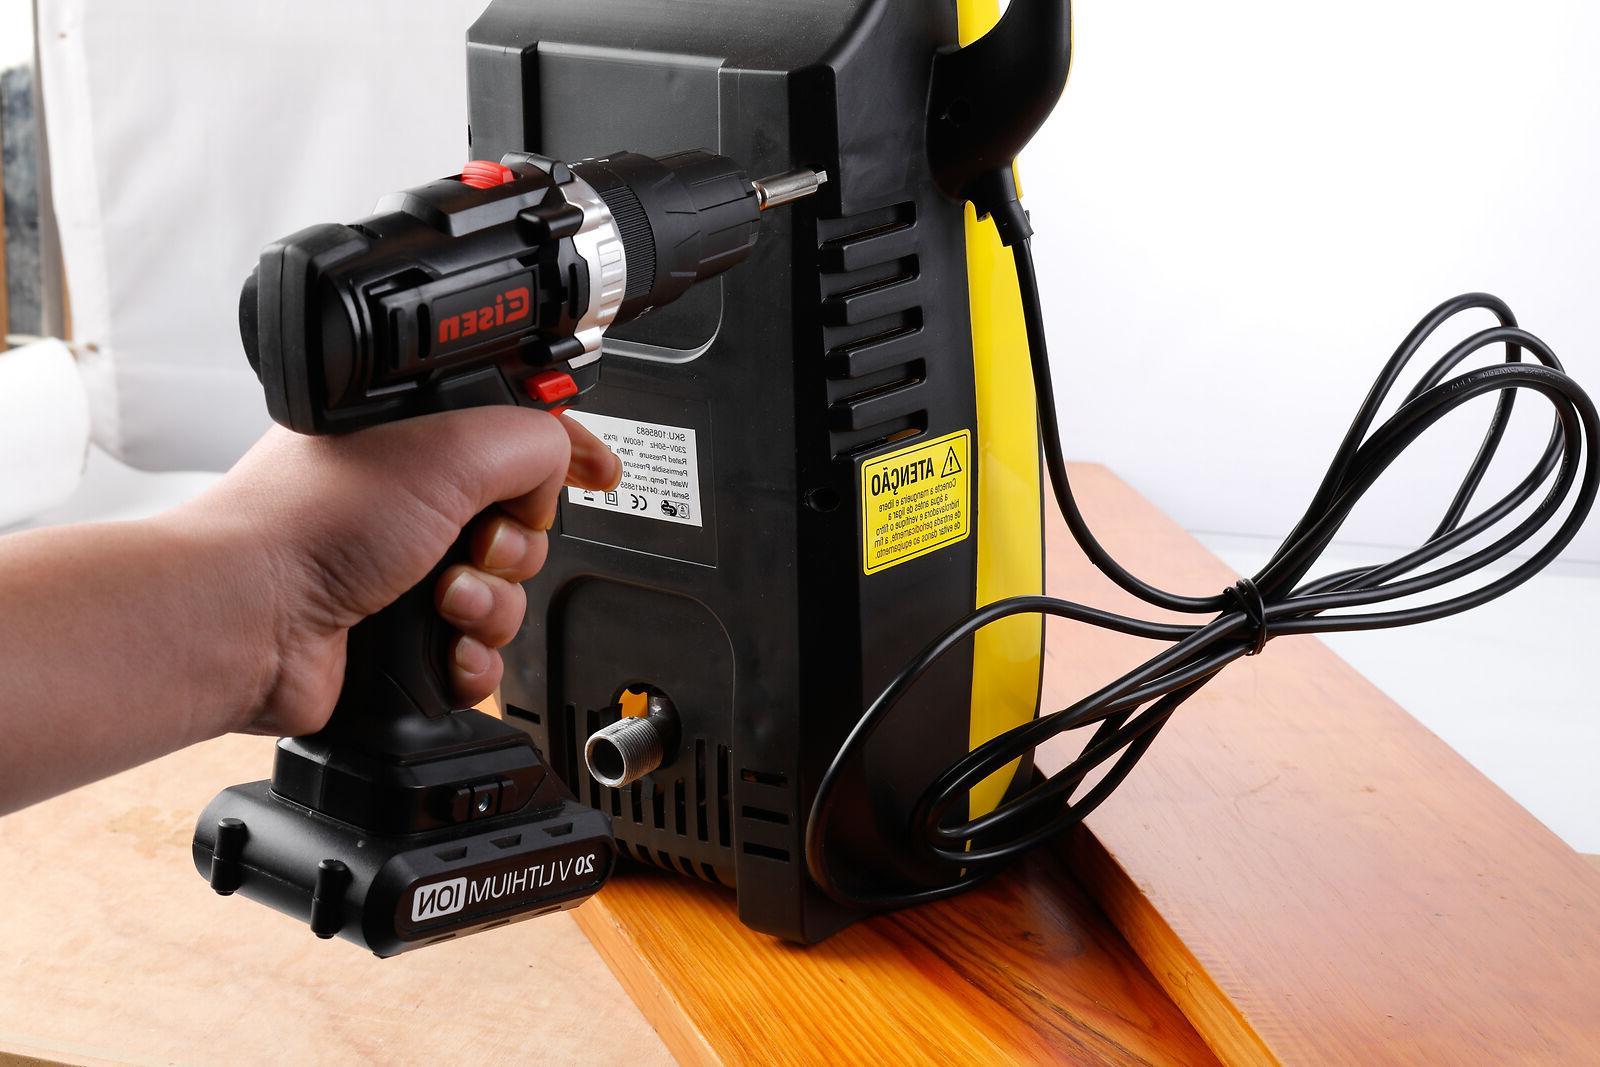 20V Cordless Impact Drill + Screwdrive Driver Tool Craftman